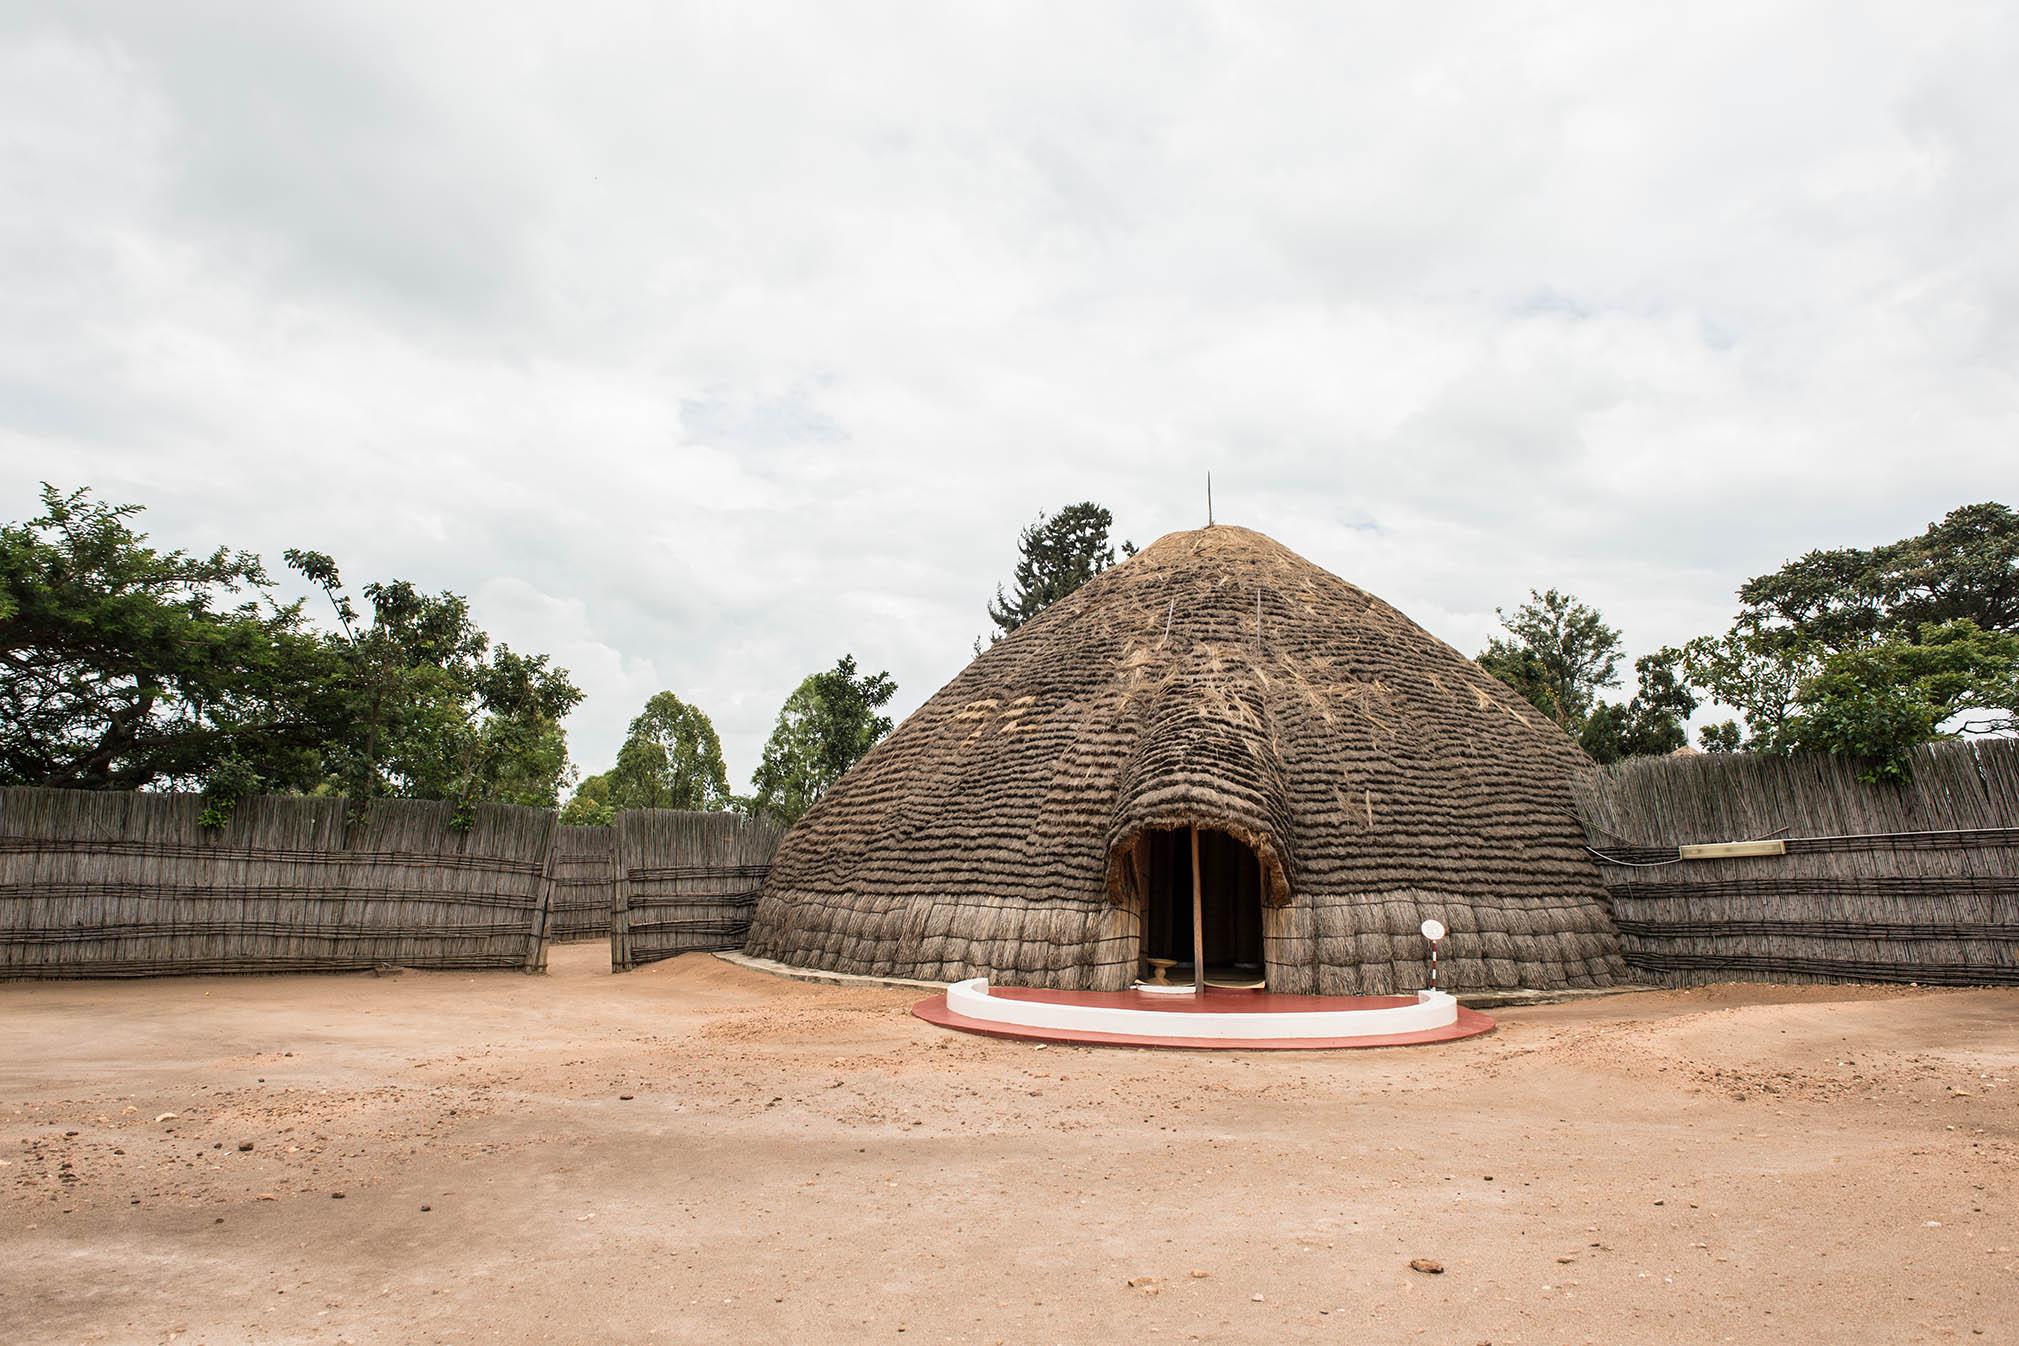 King's Palace, Nyanza, Rwanda